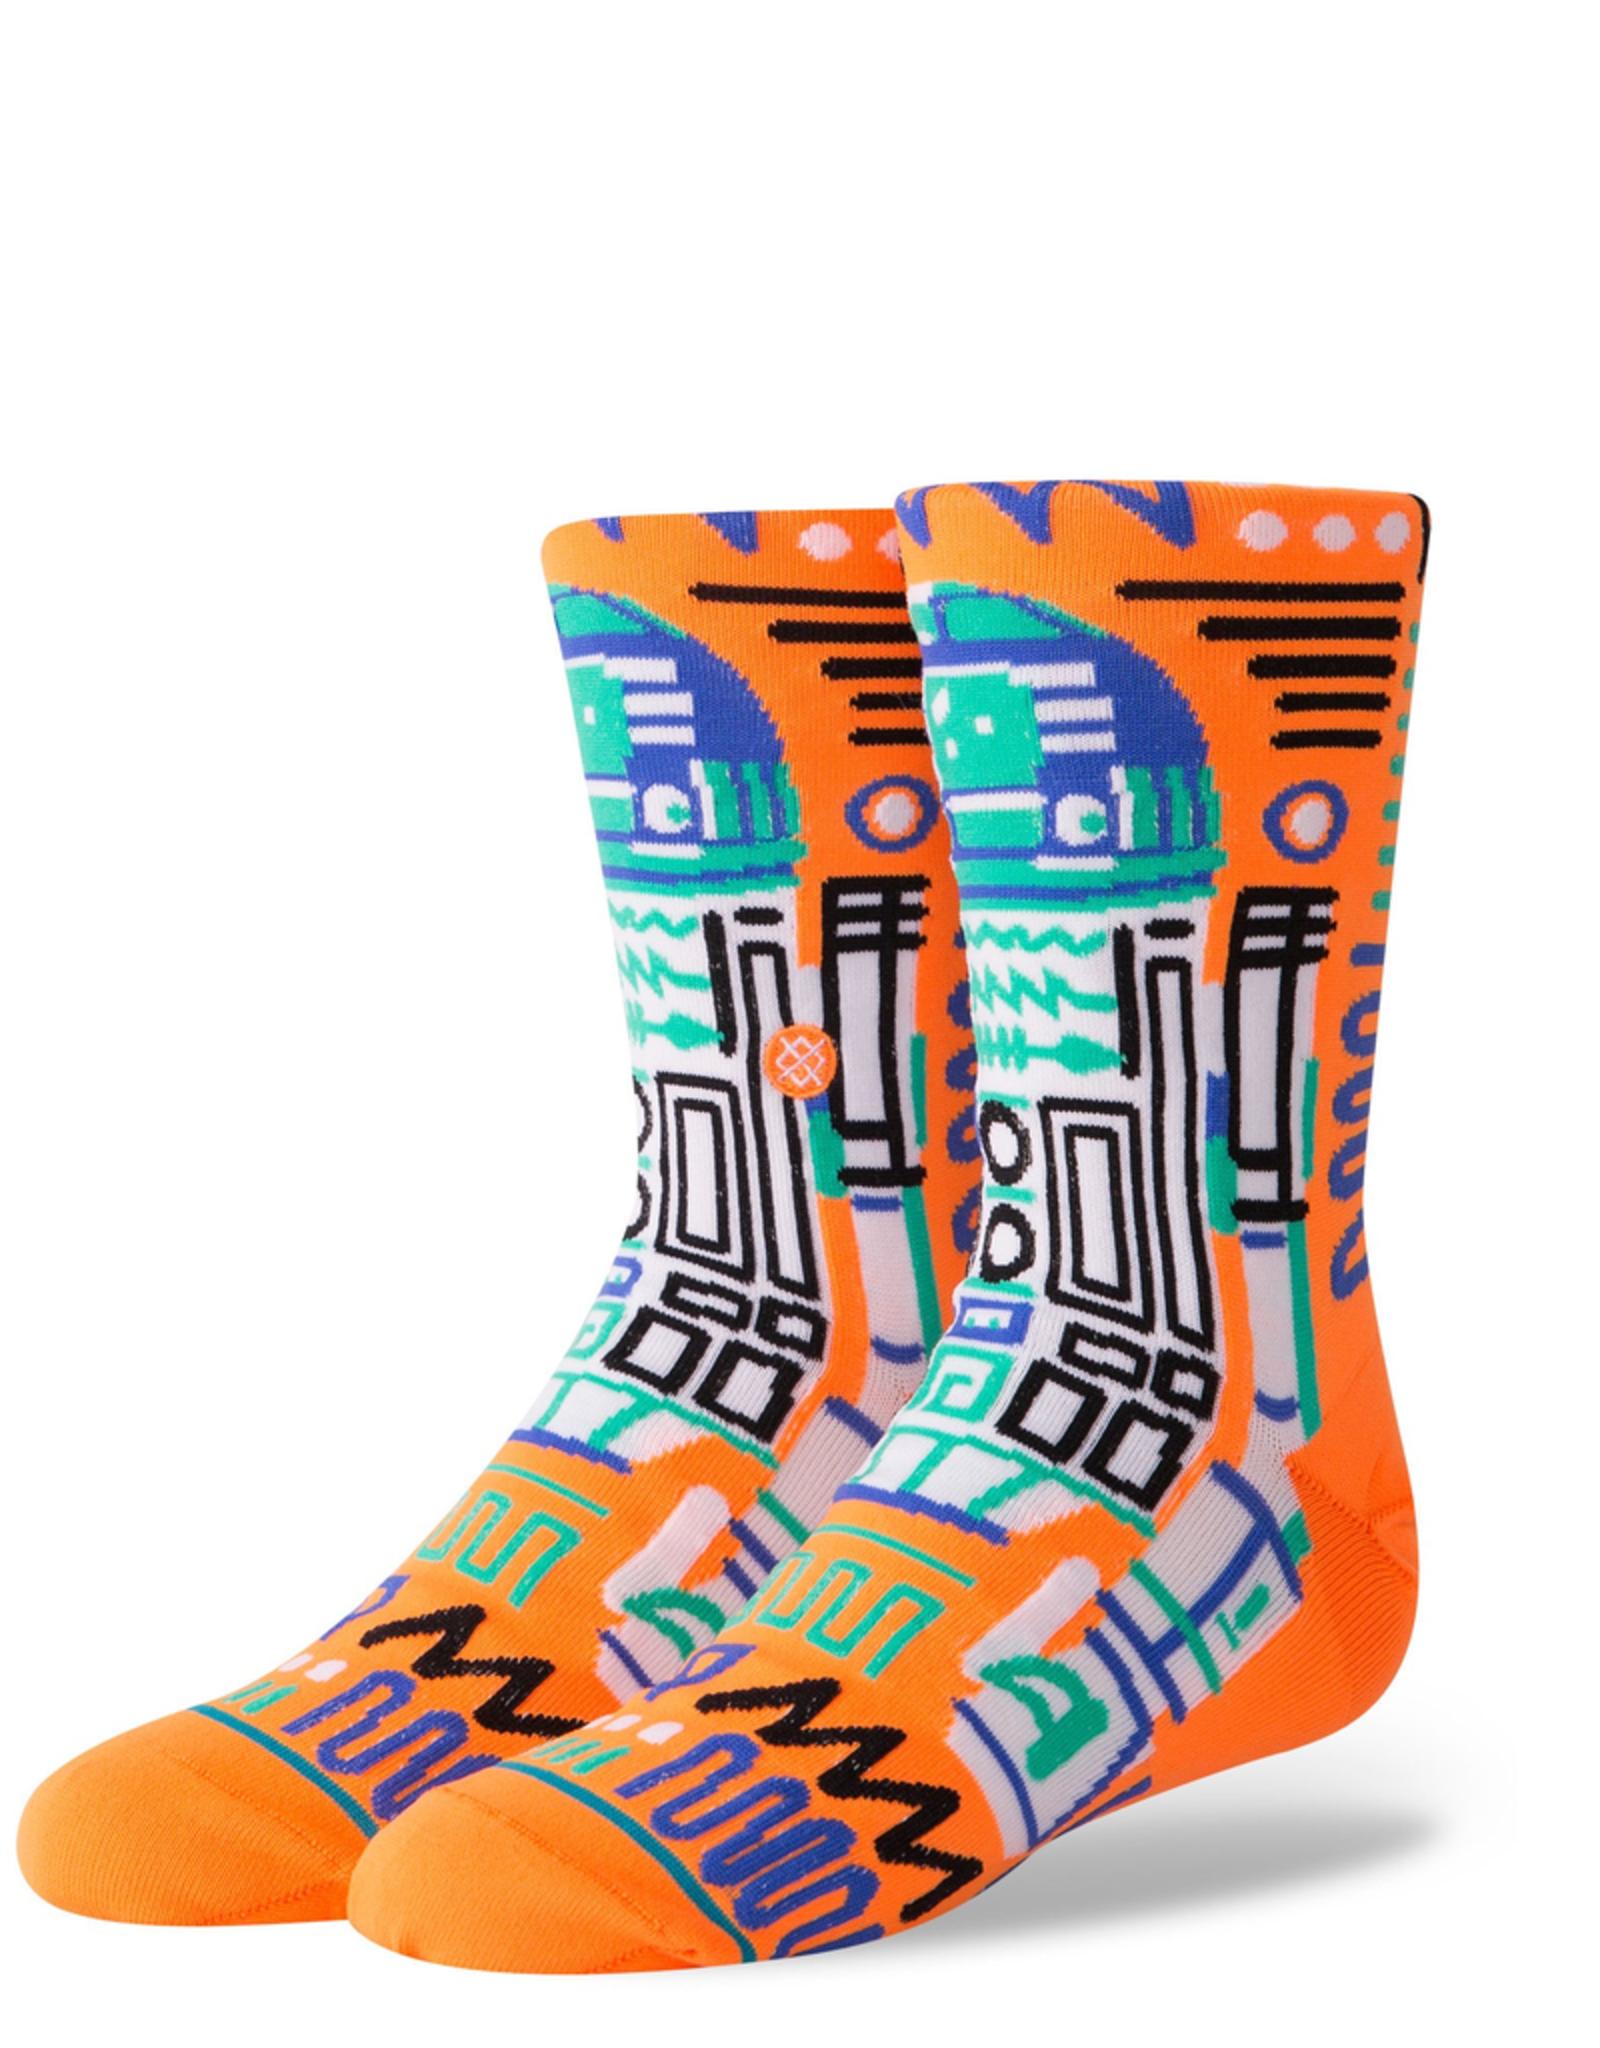 Stance Socks Boys Star Wars Probability Socks